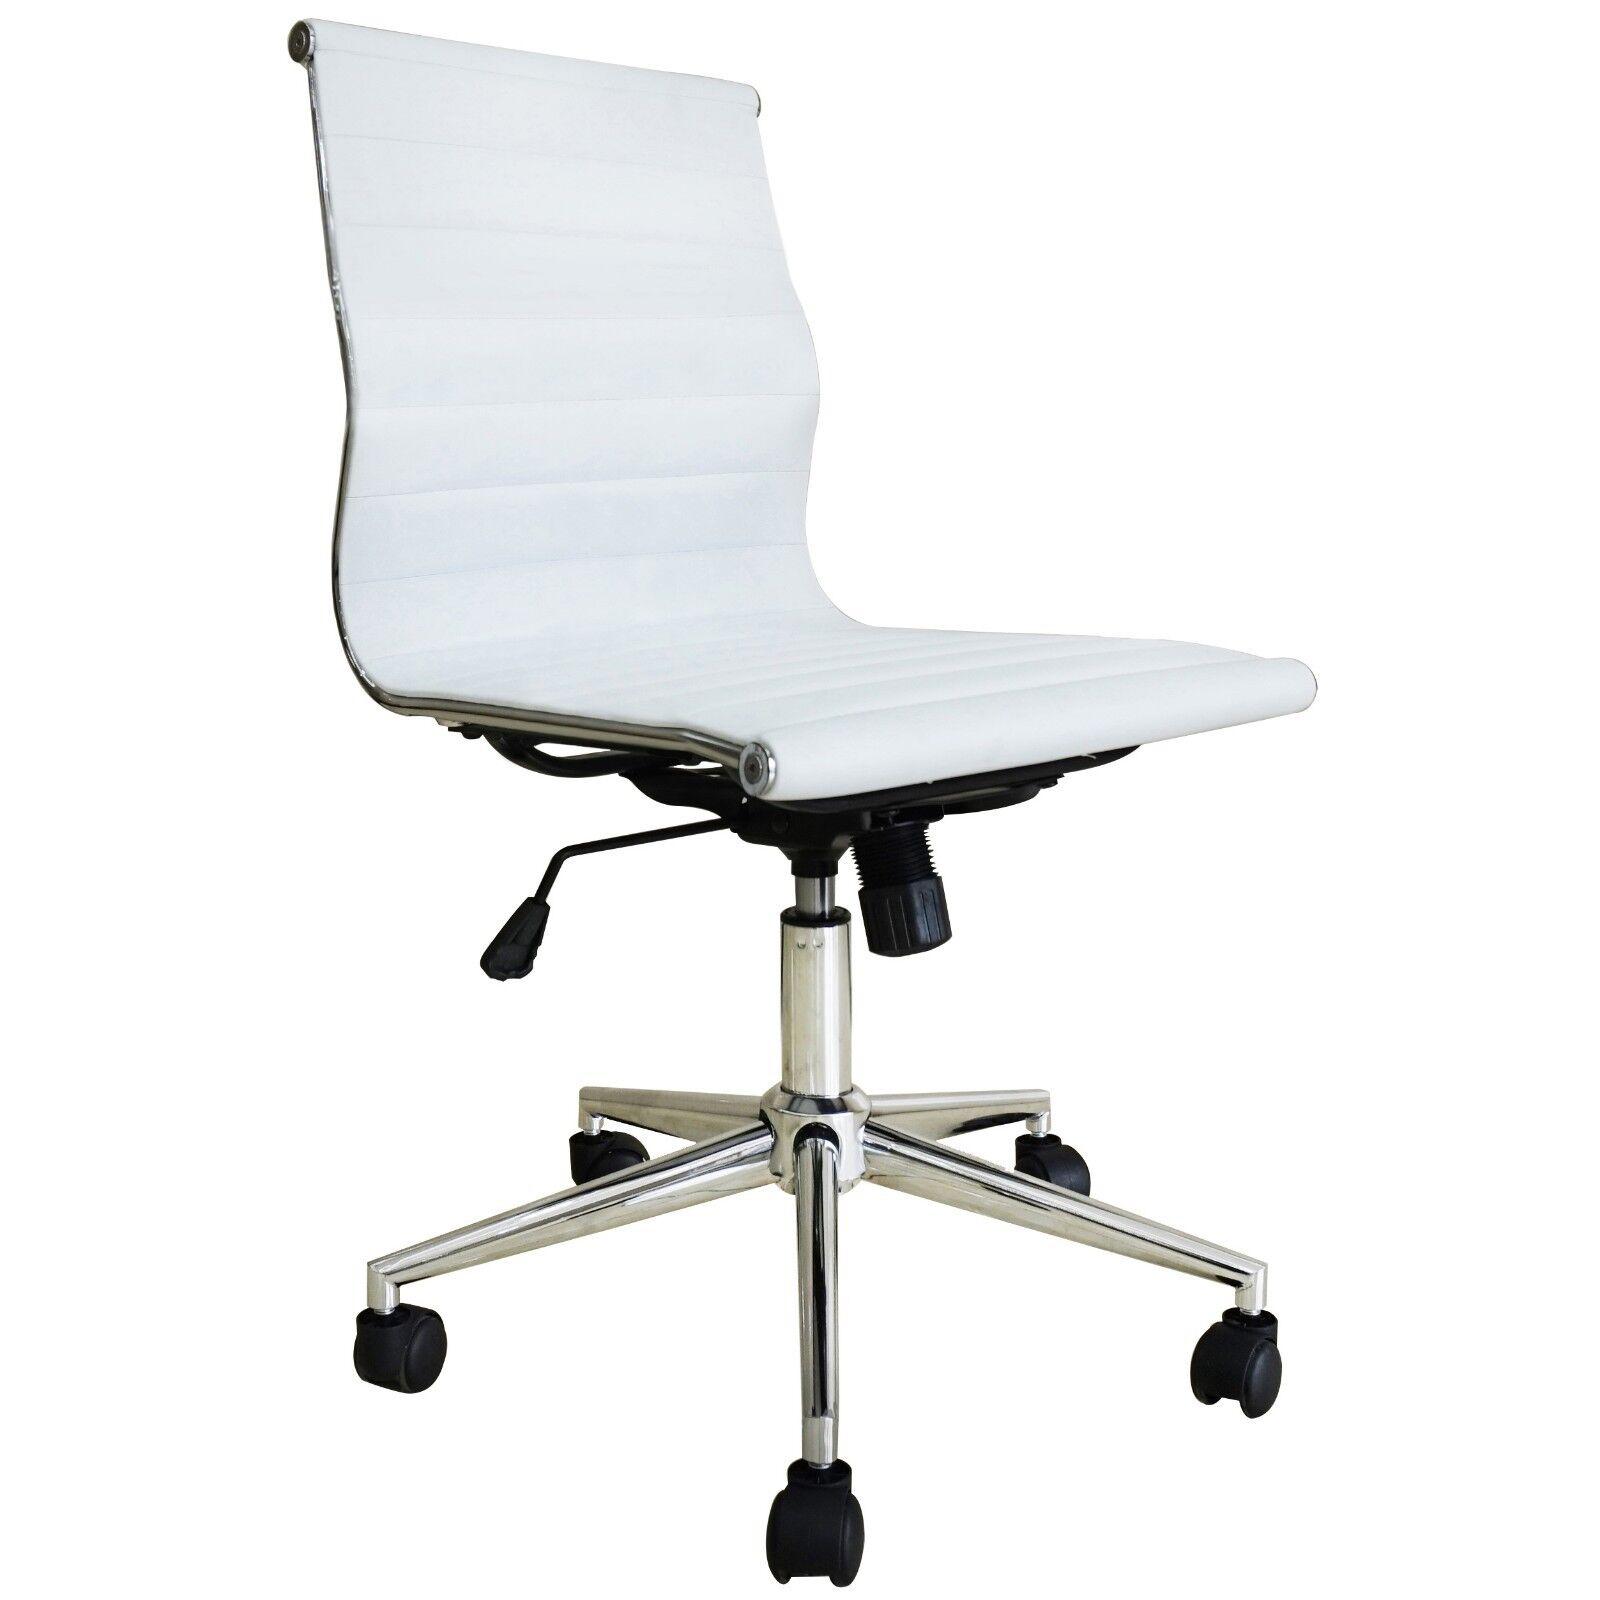 2 Piece Modern Executive Office Chair Mid back PU Leather Armless Desk Chair